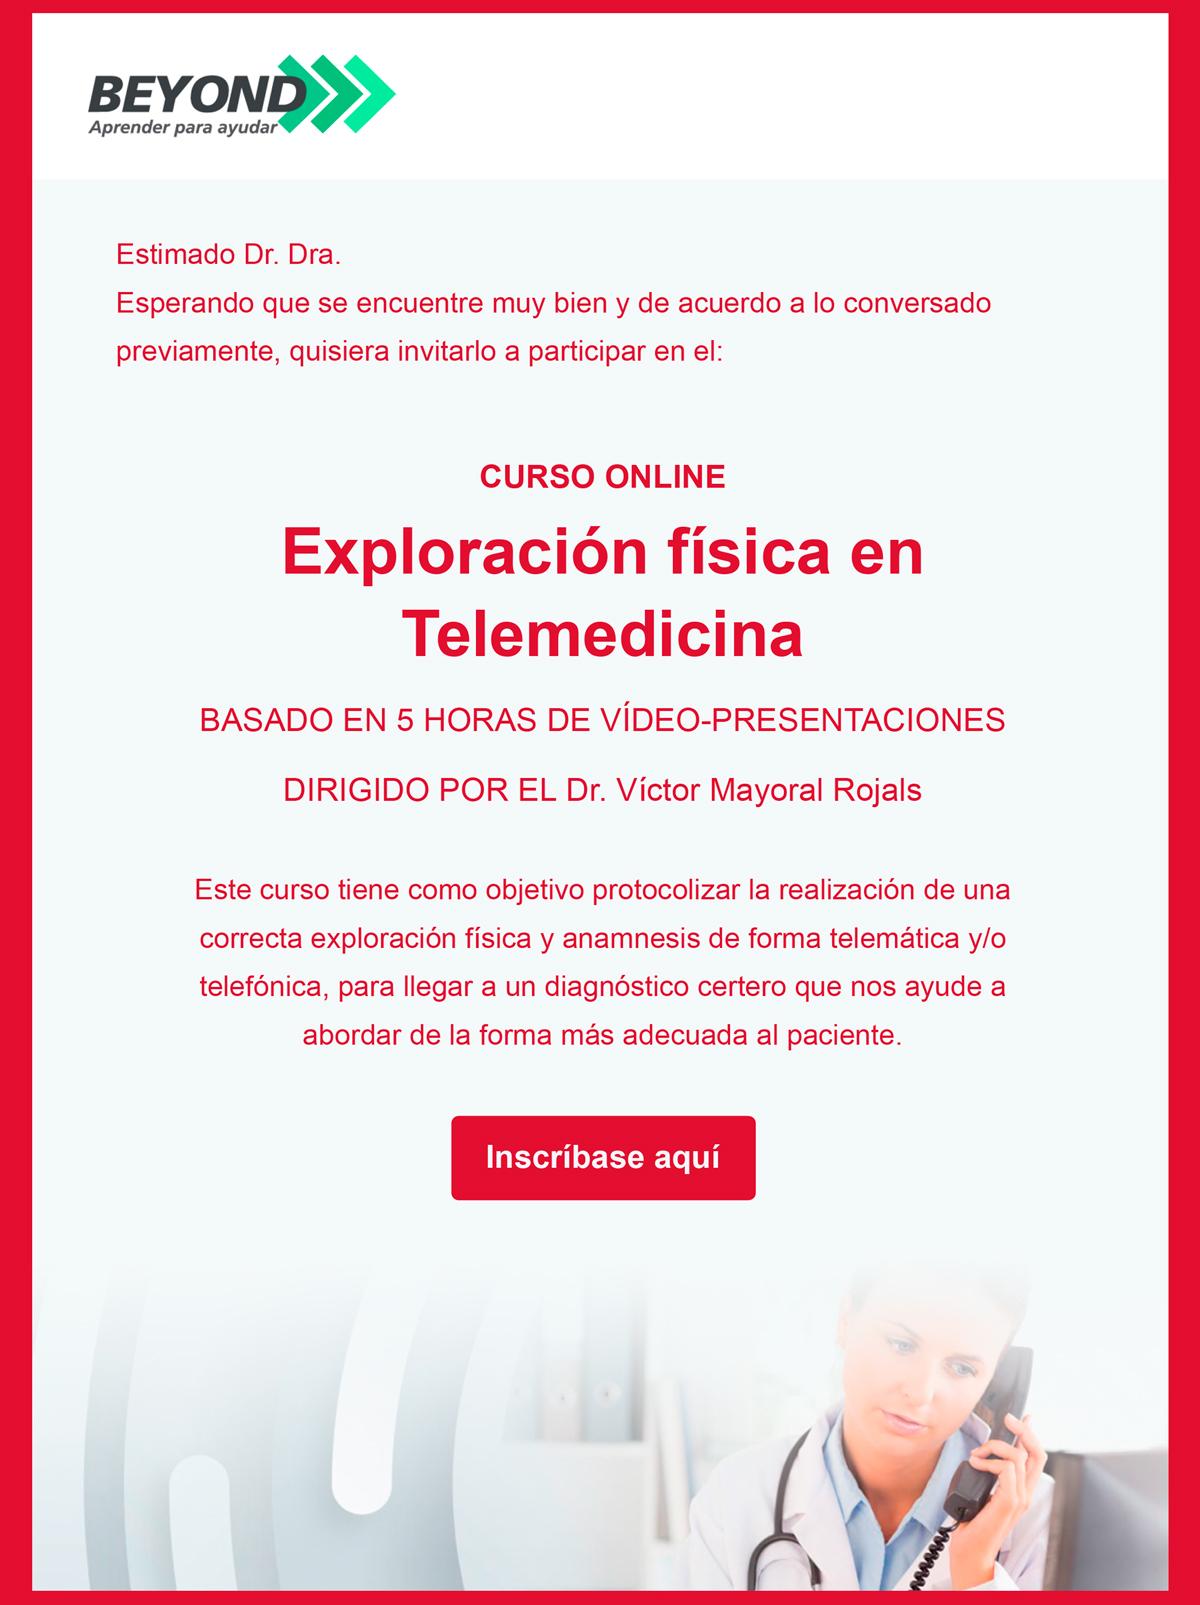 exploracion-fisica-en-telemedicina.jpg